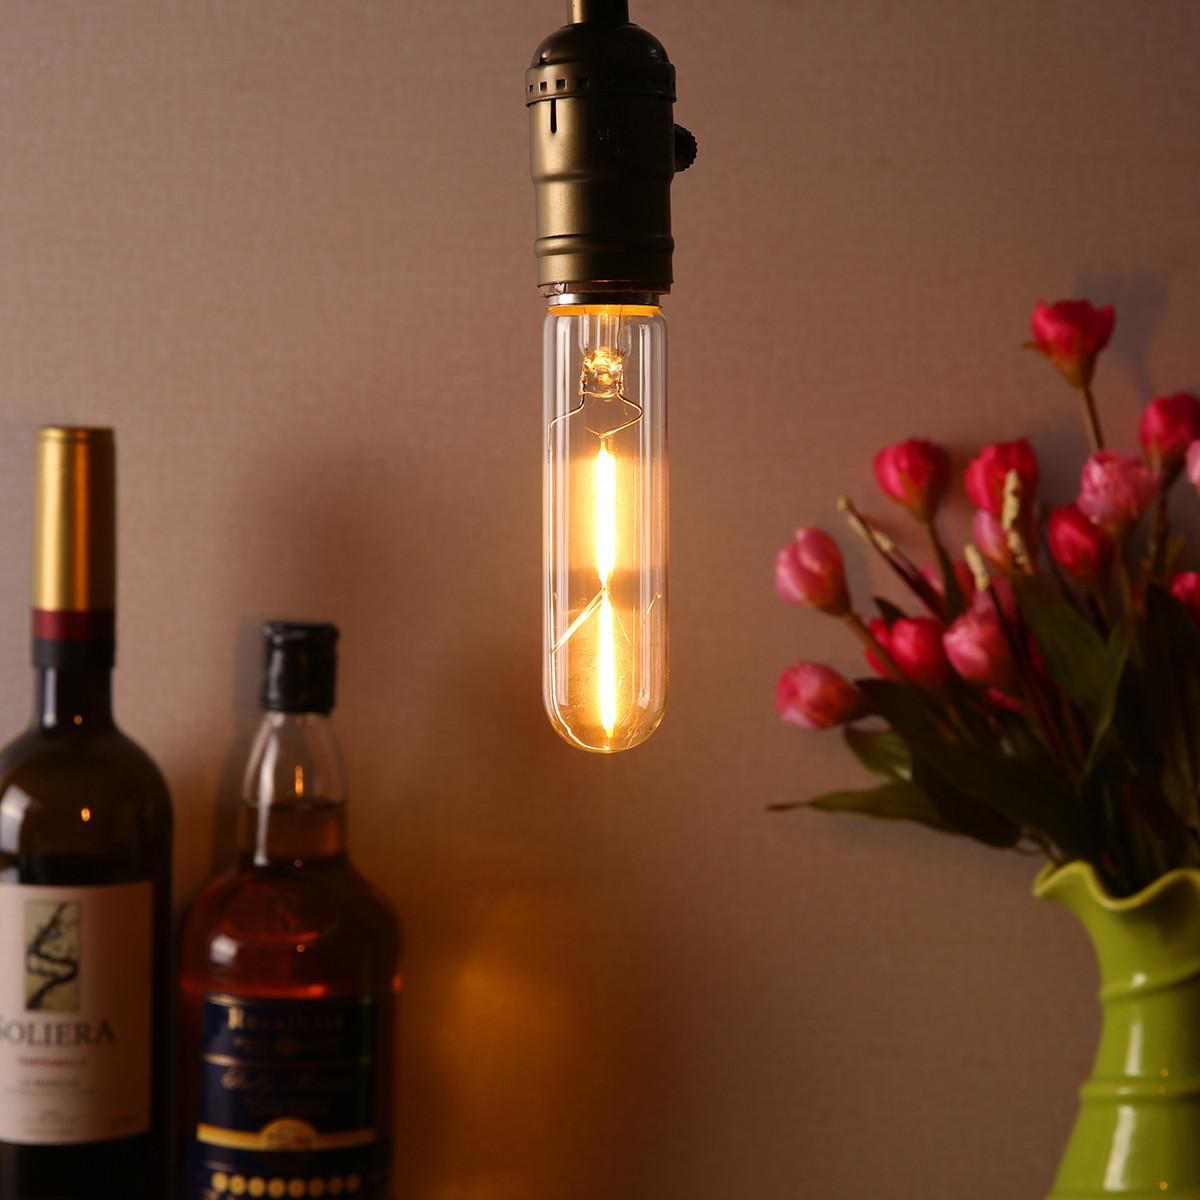 T10 E27 1.8W Теплый белый 200LM COB LED Лампа накаливания Retro Edison Лампа AC110-240V - 1TopShop